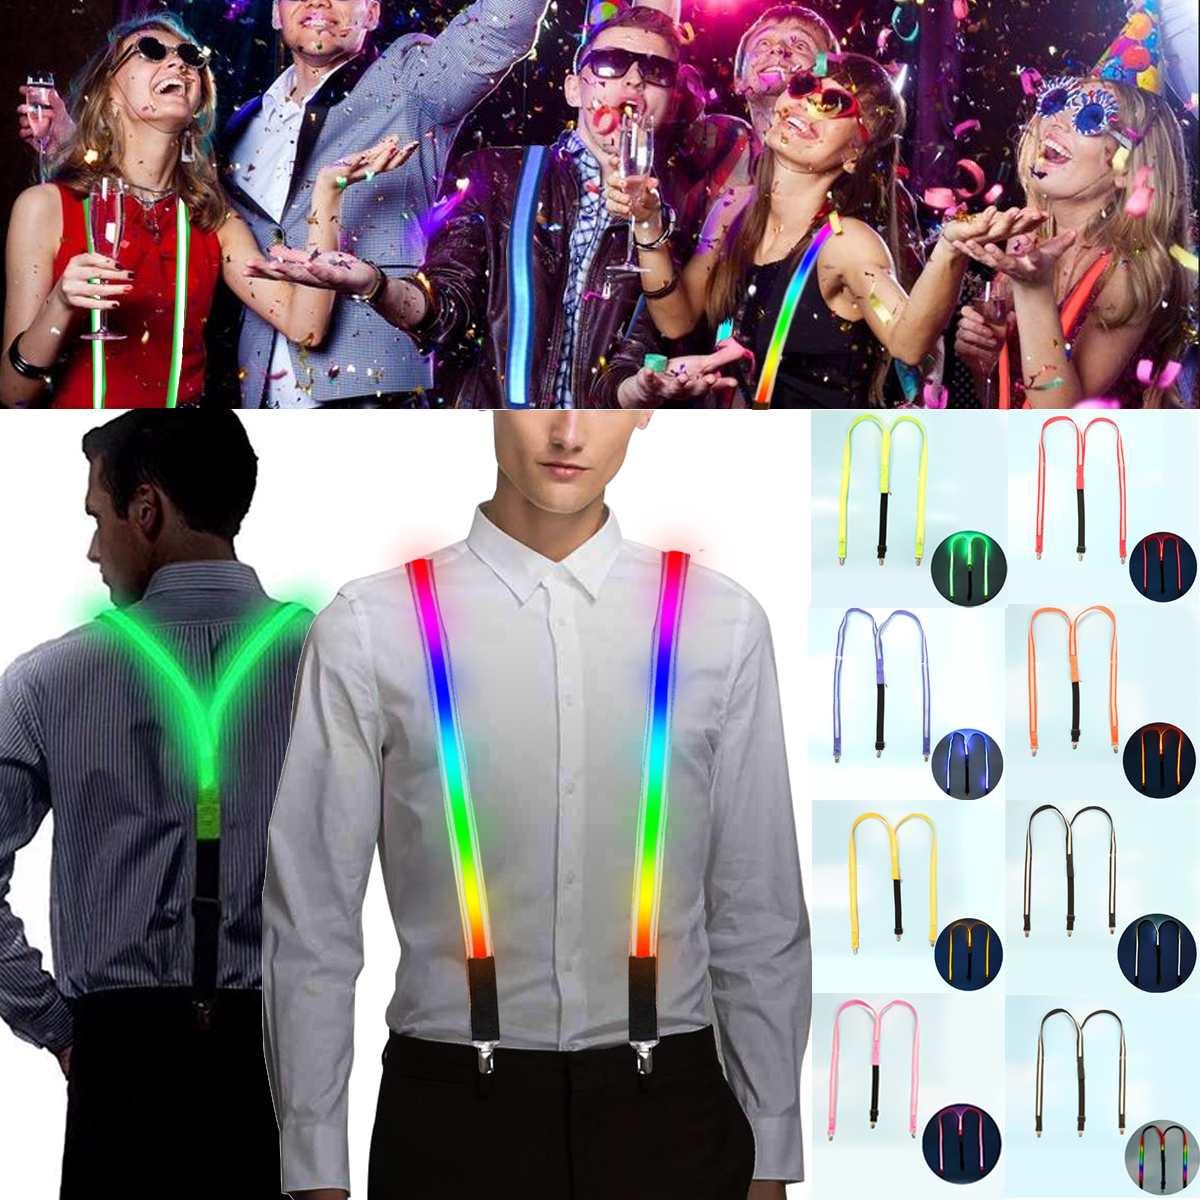 1PCS Printed LED Suspenders Men 3 Clips-on Braces Vintage Mens Suspender For Trousers Husband Male Suspensorio For Skirt